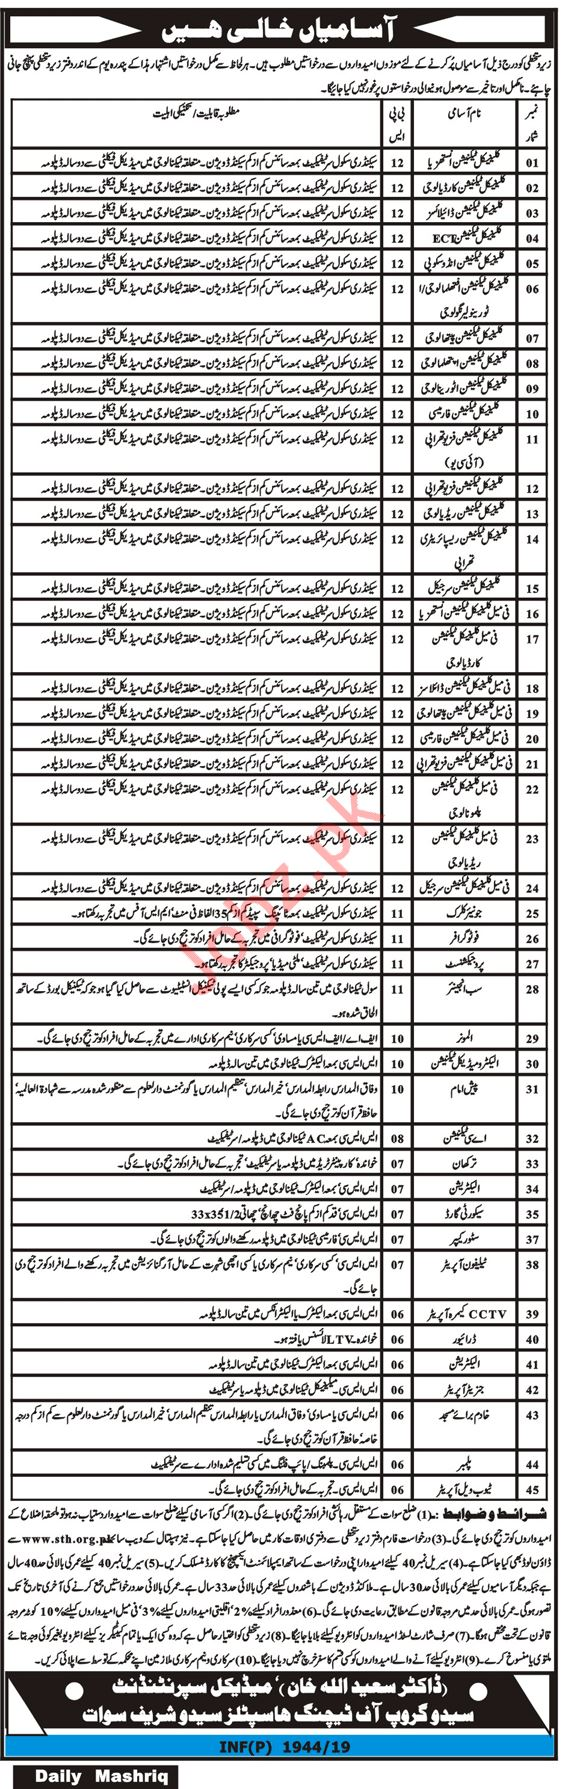 Saidu Group of Teaching Hospitals Jobs 2019 For Swat KPK